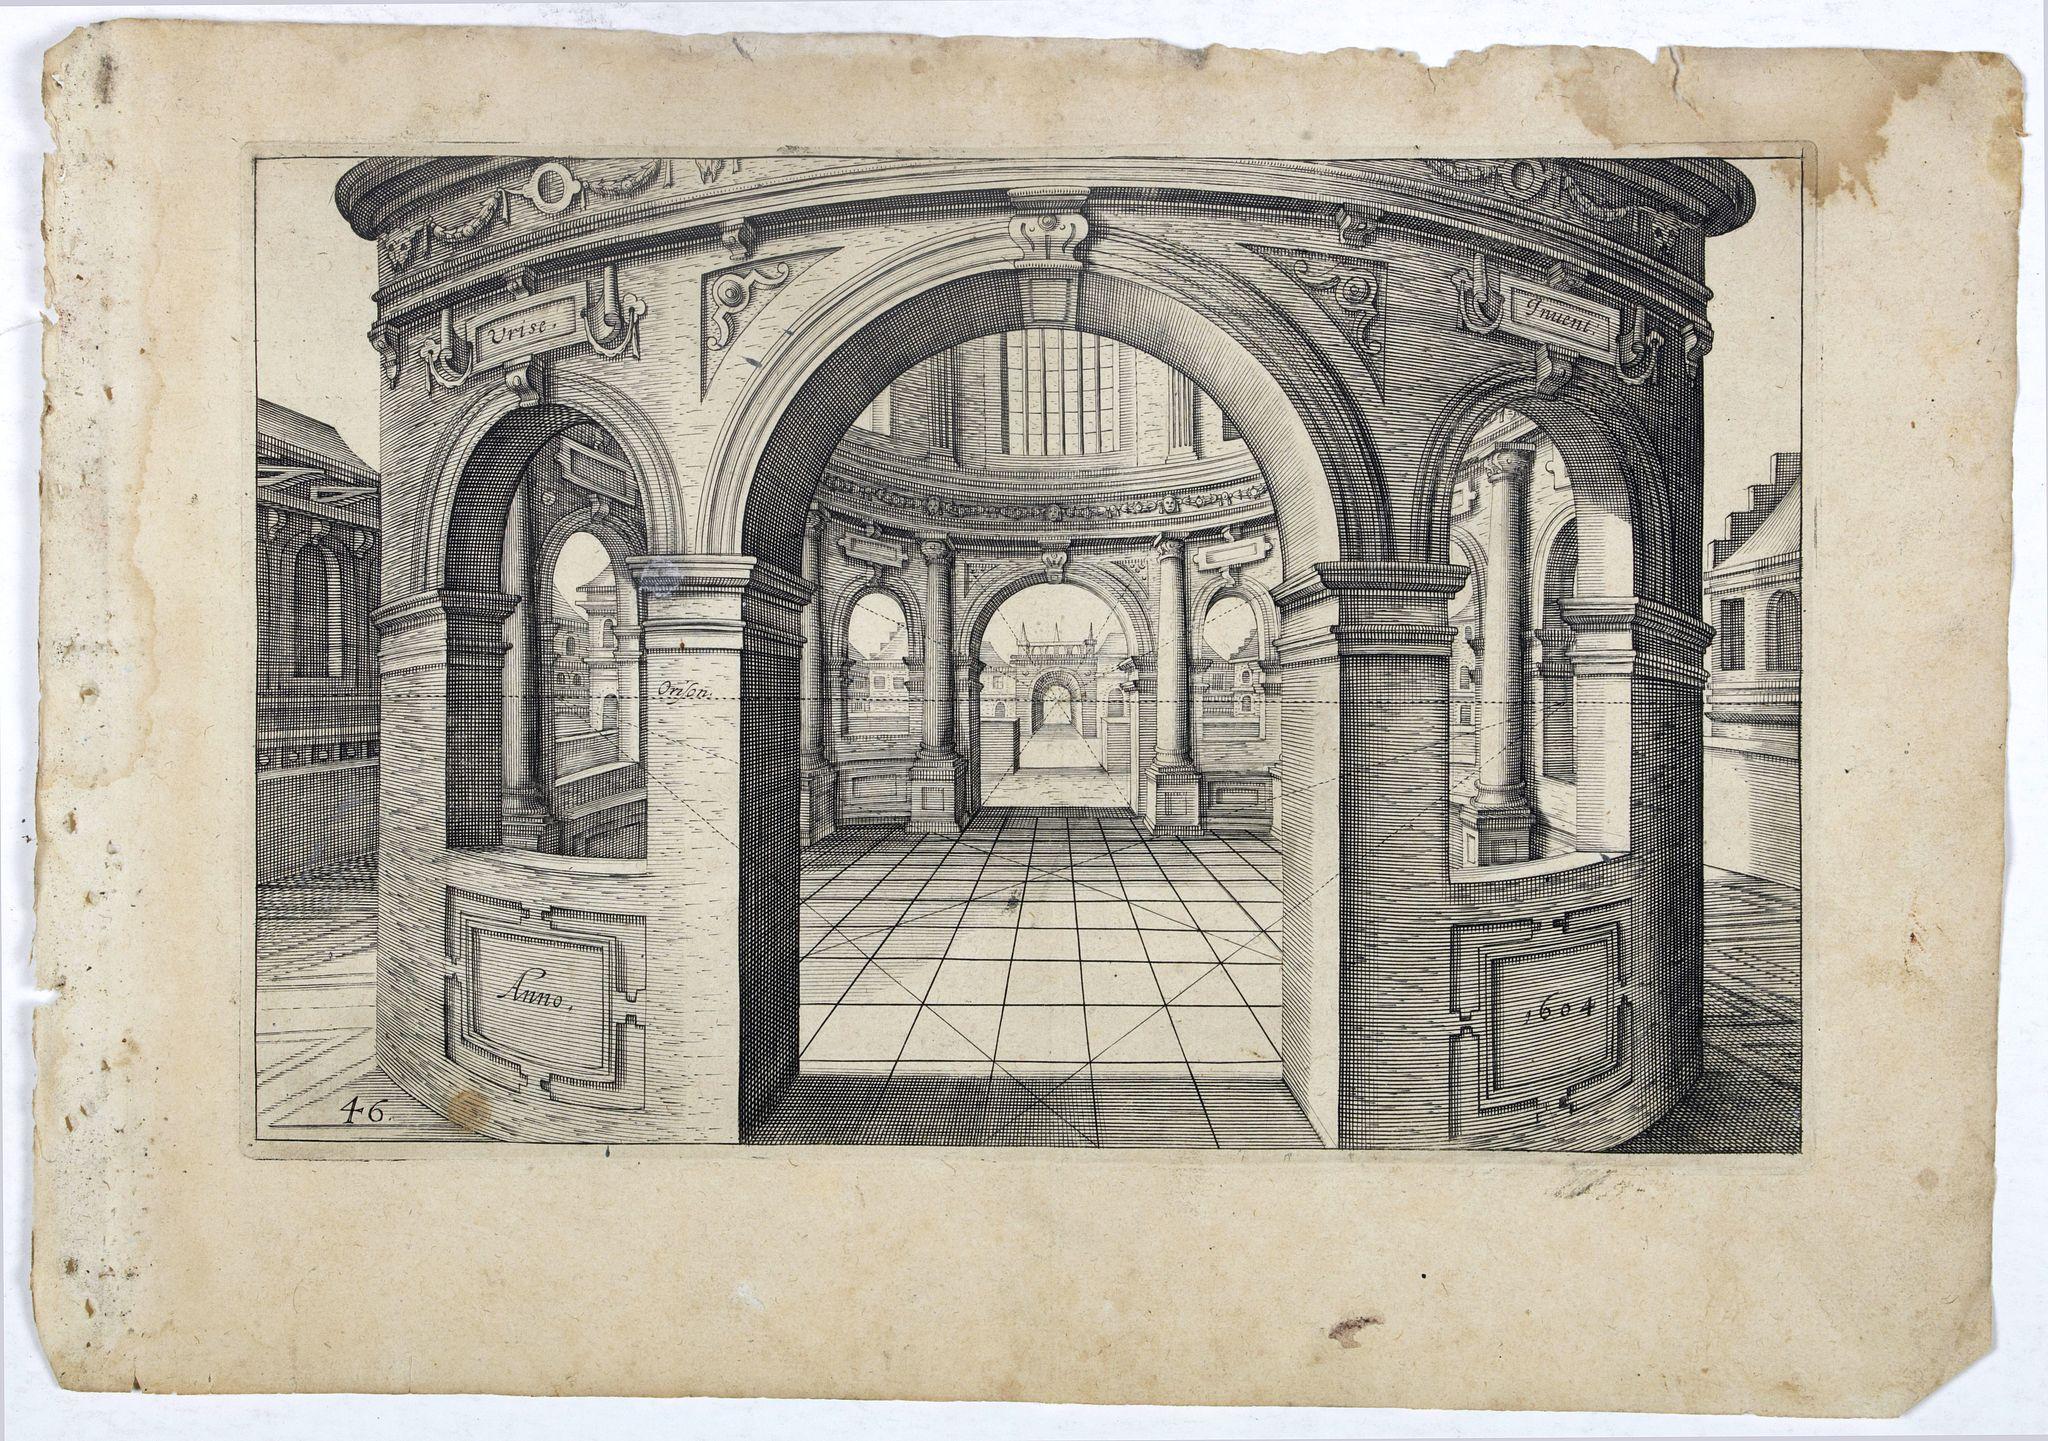 VREDEMAN DE VRIES, J. / HONDIUS, H. -  Perspective print by Vredeman de Vries. 46.